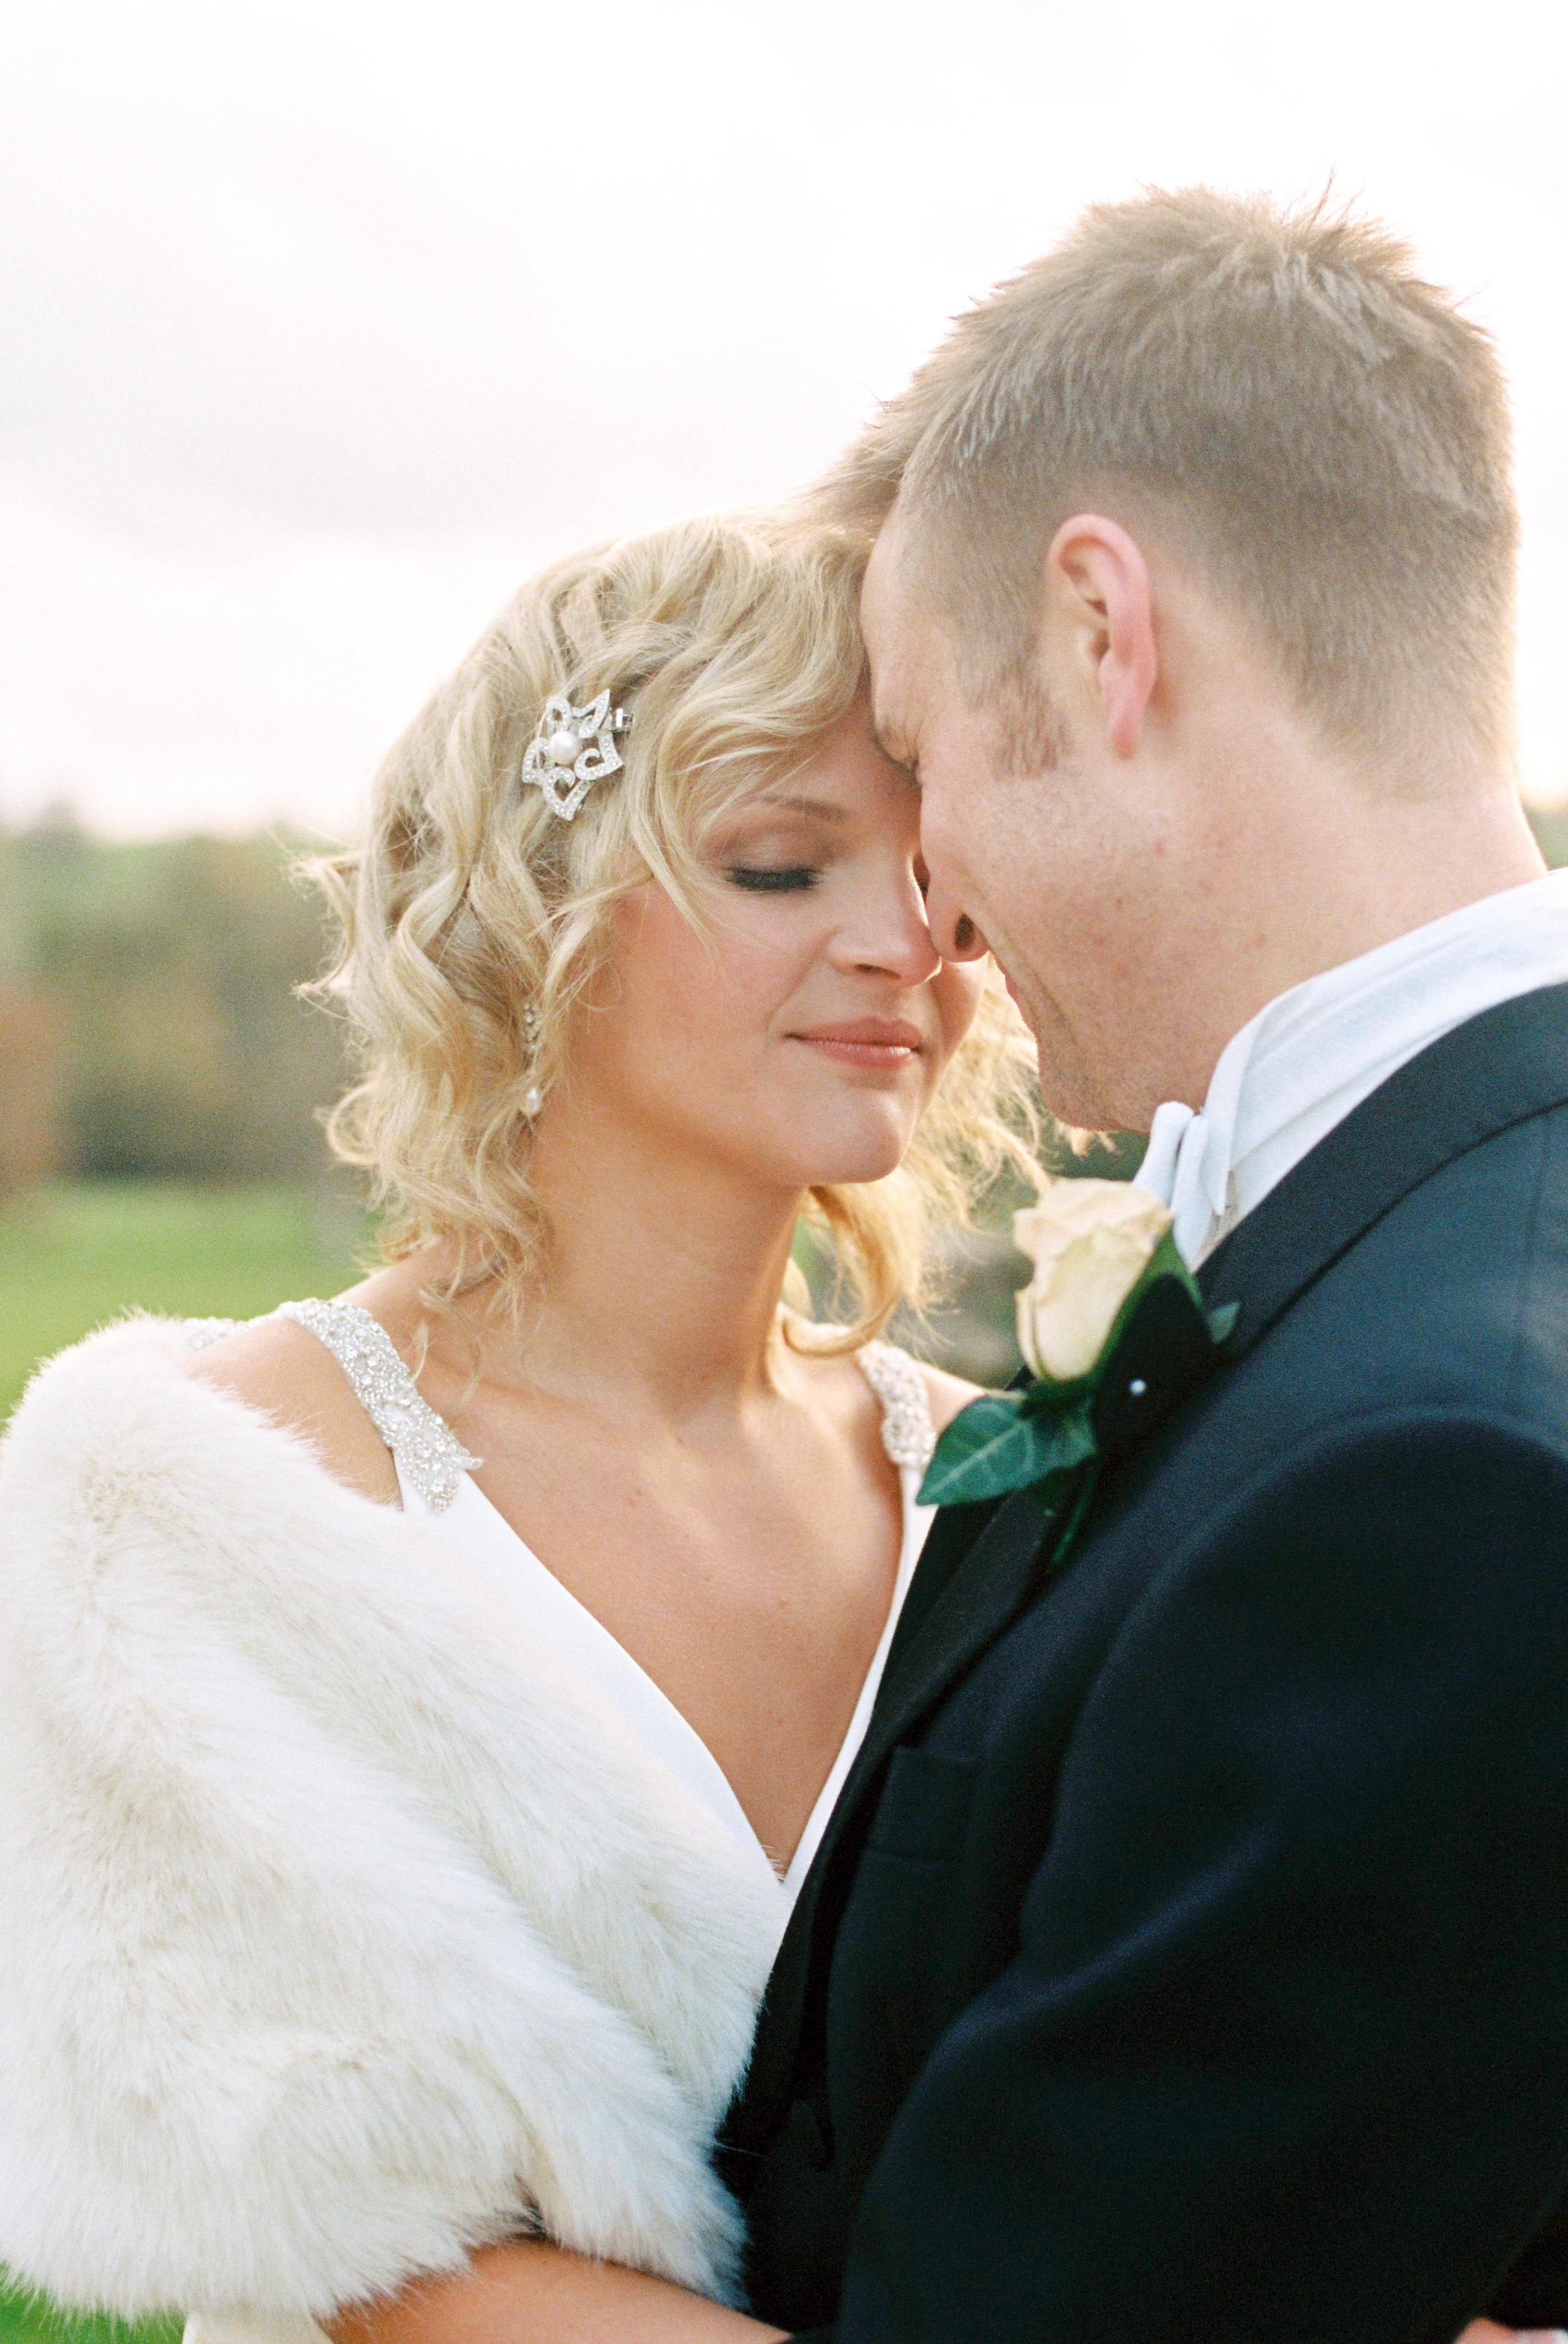 england_wedding_(c)_rory_wylie-8.jpg